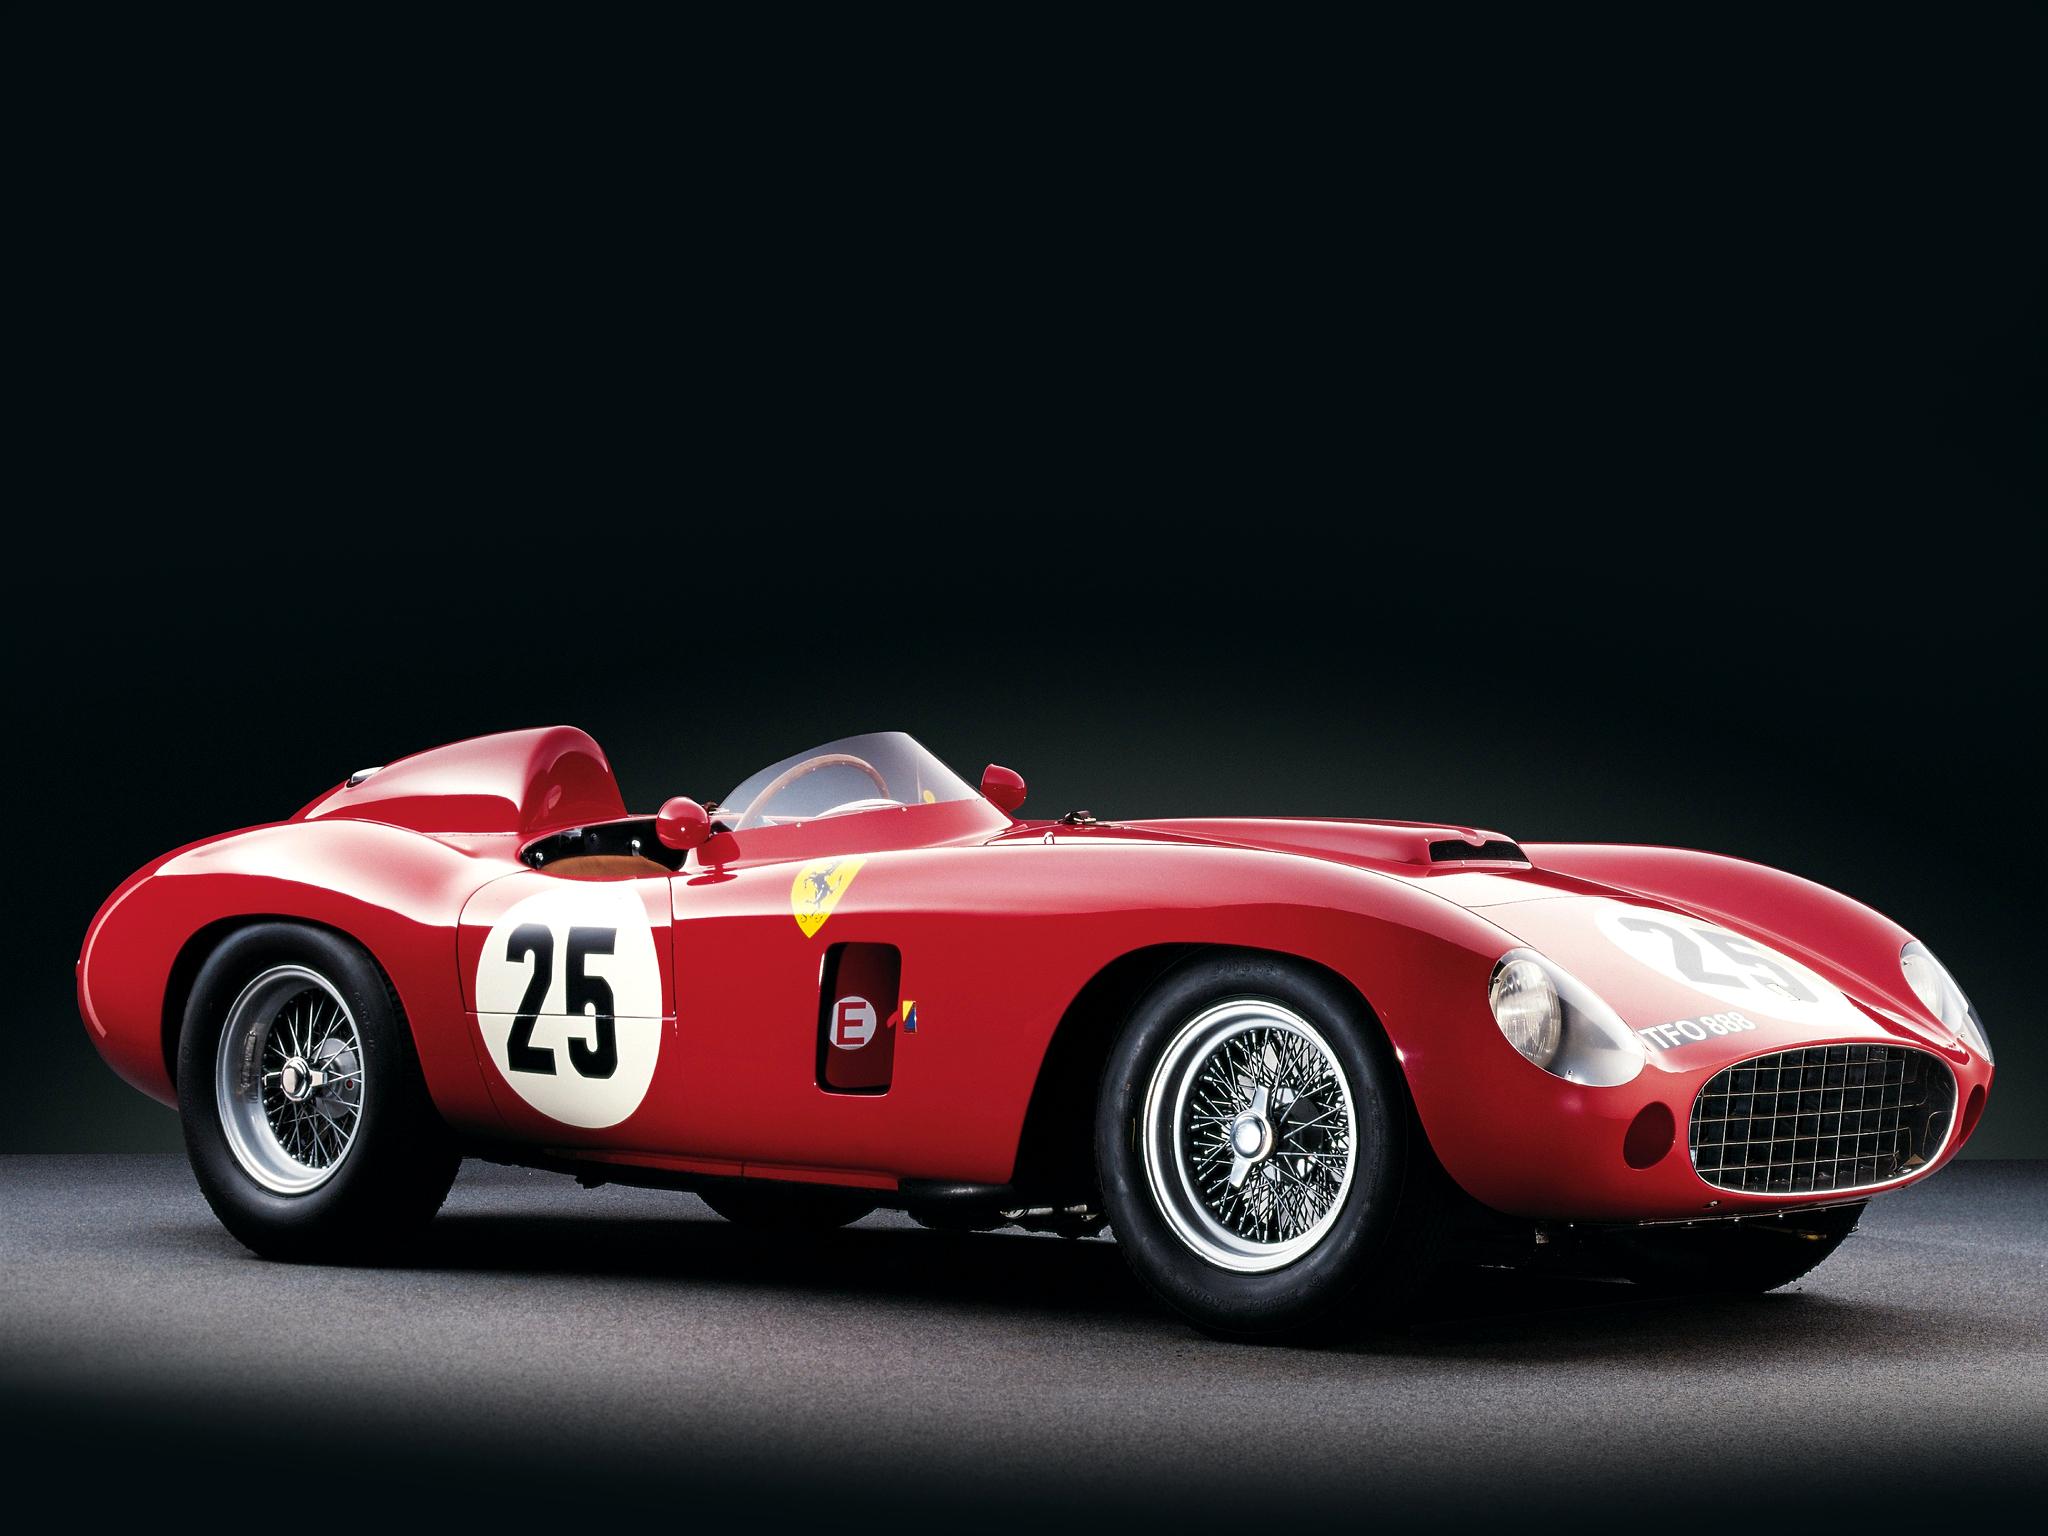 1956 Ferrari 860 Monza race racing supercar retro h ...